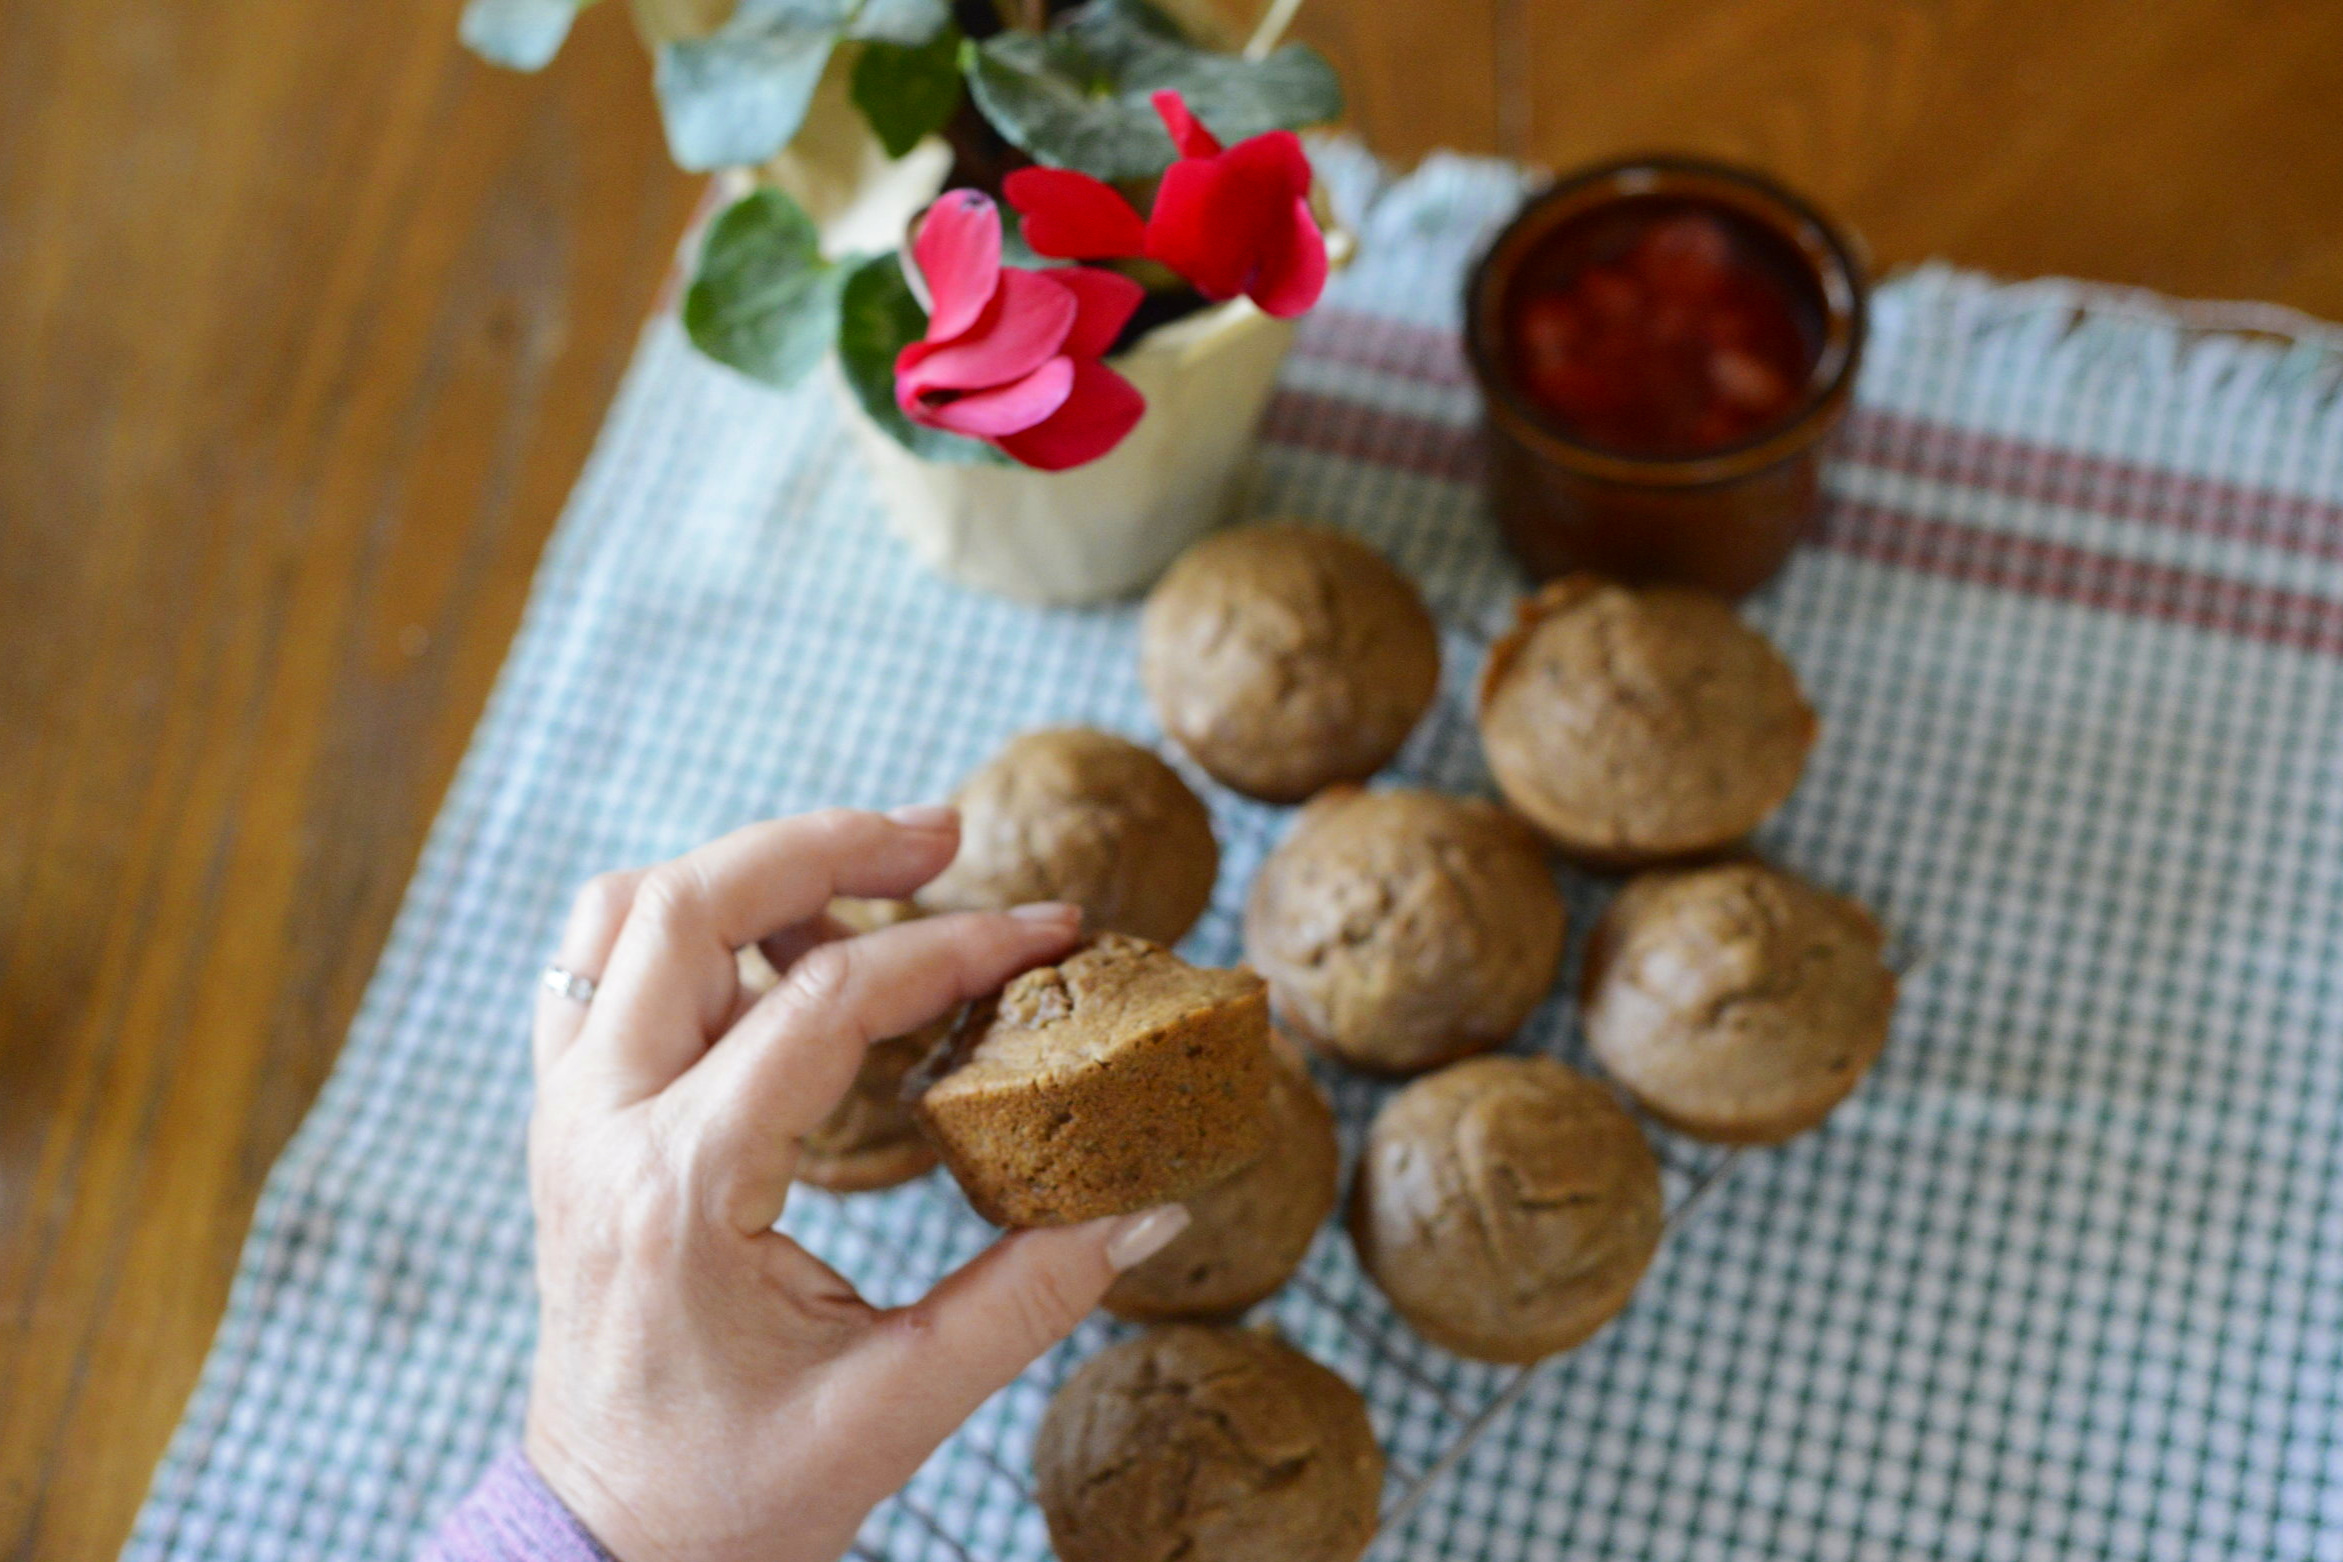 Chestnut+Flour+Banana+Muffins+-+Emily+Nachazel.jpg